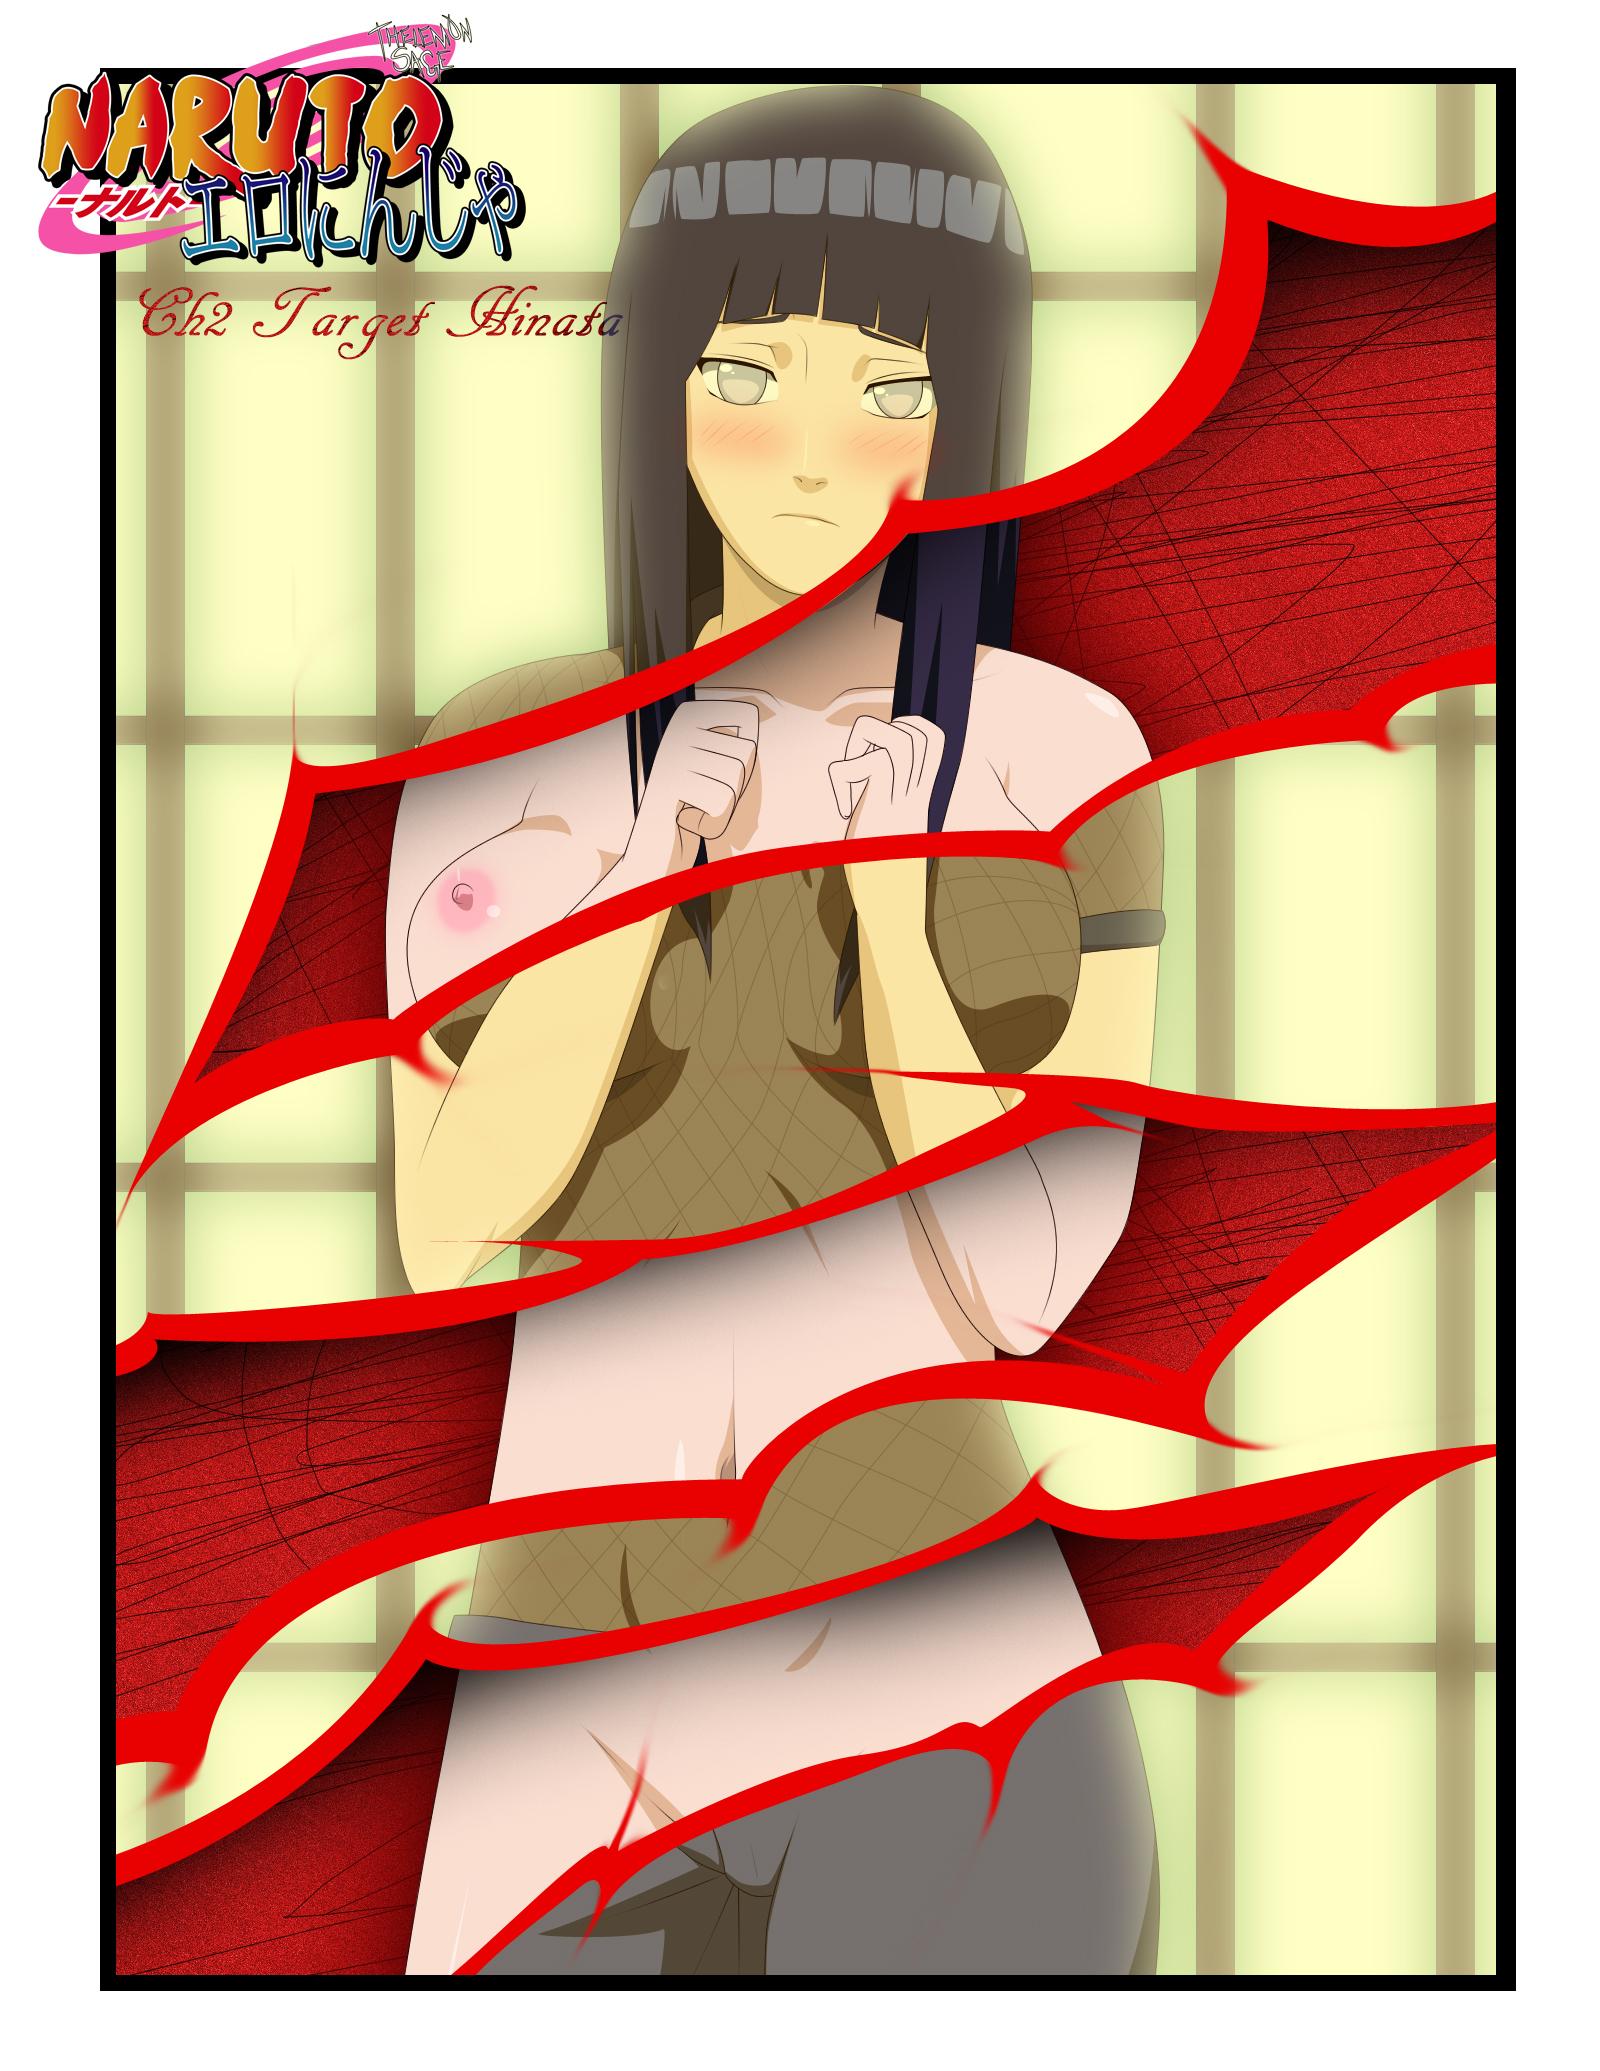 Goodcomix.tk Naruto - [StikyfinkaZ-003] - The Birth Of The EroNinja - Chapter 2 - Target Hinata